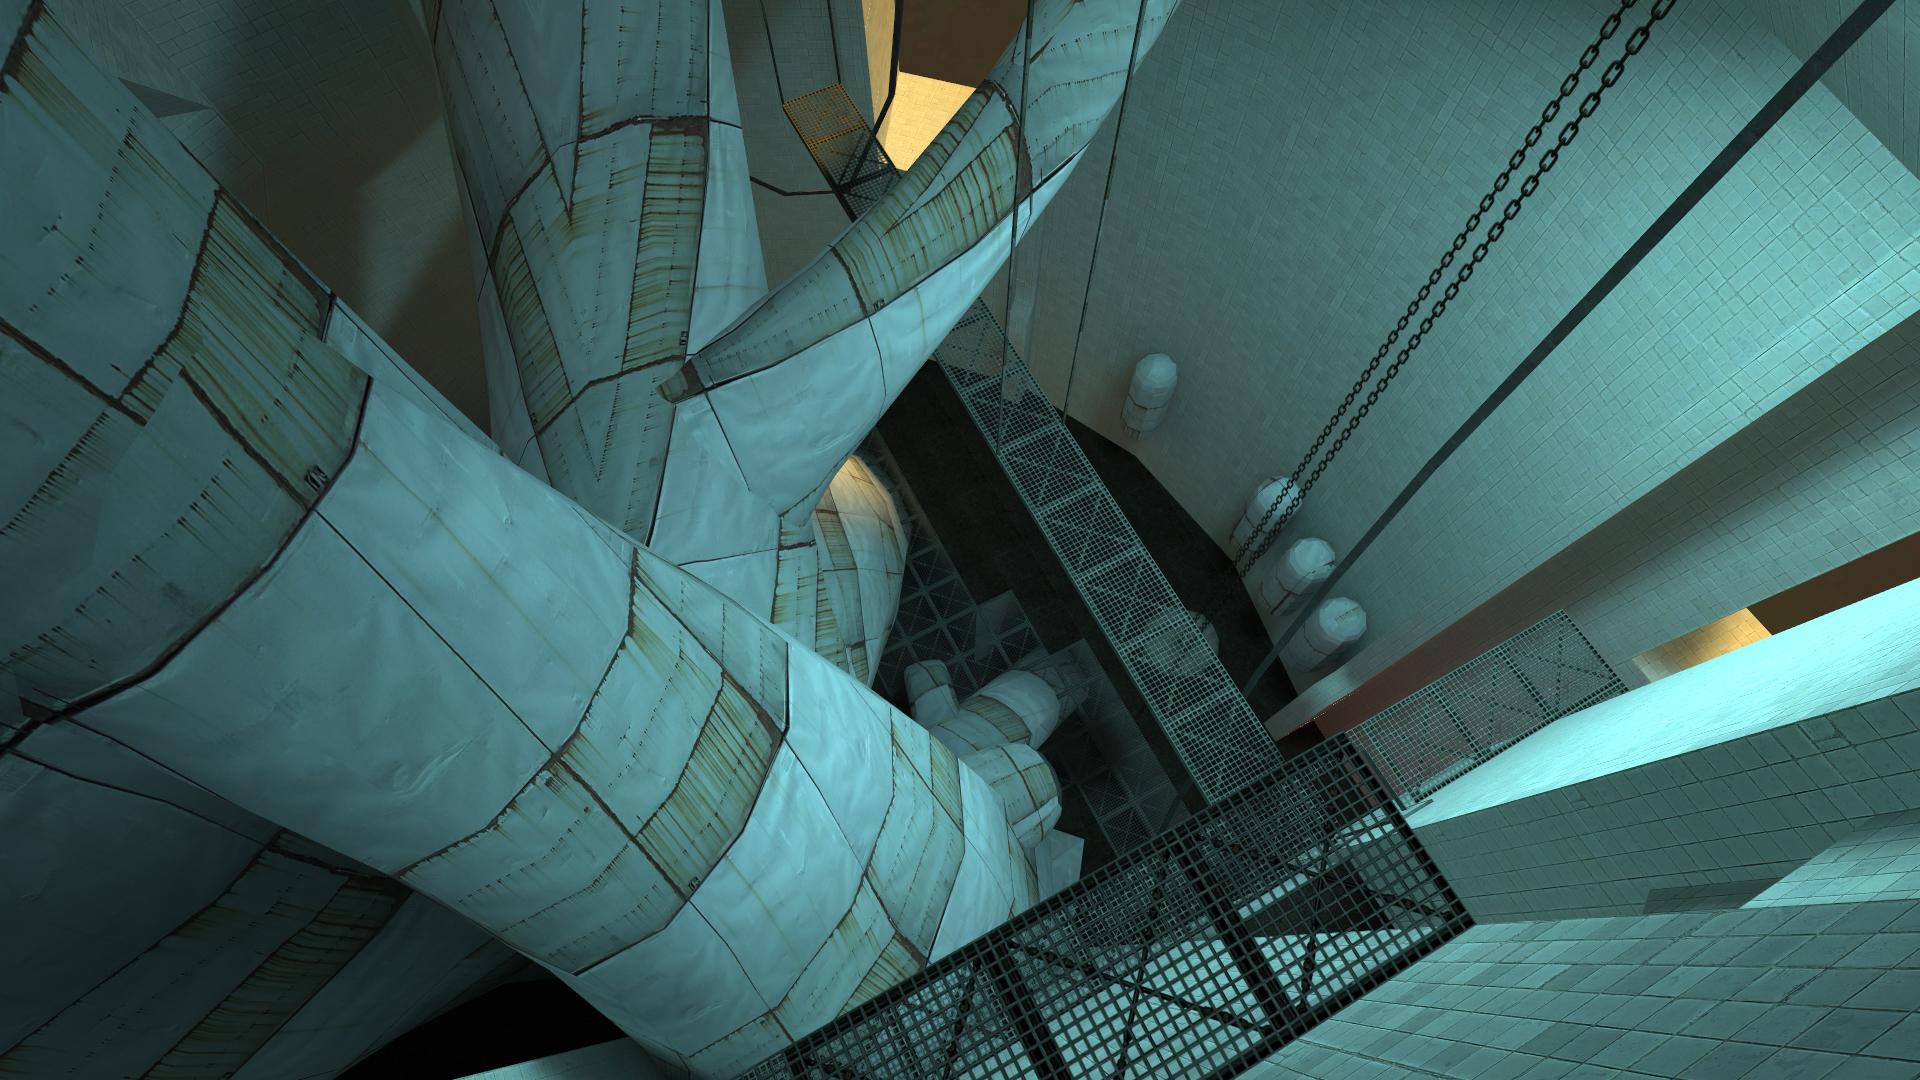 Half Life 2 Beta Discussion V2 Interesting Enough To Make A